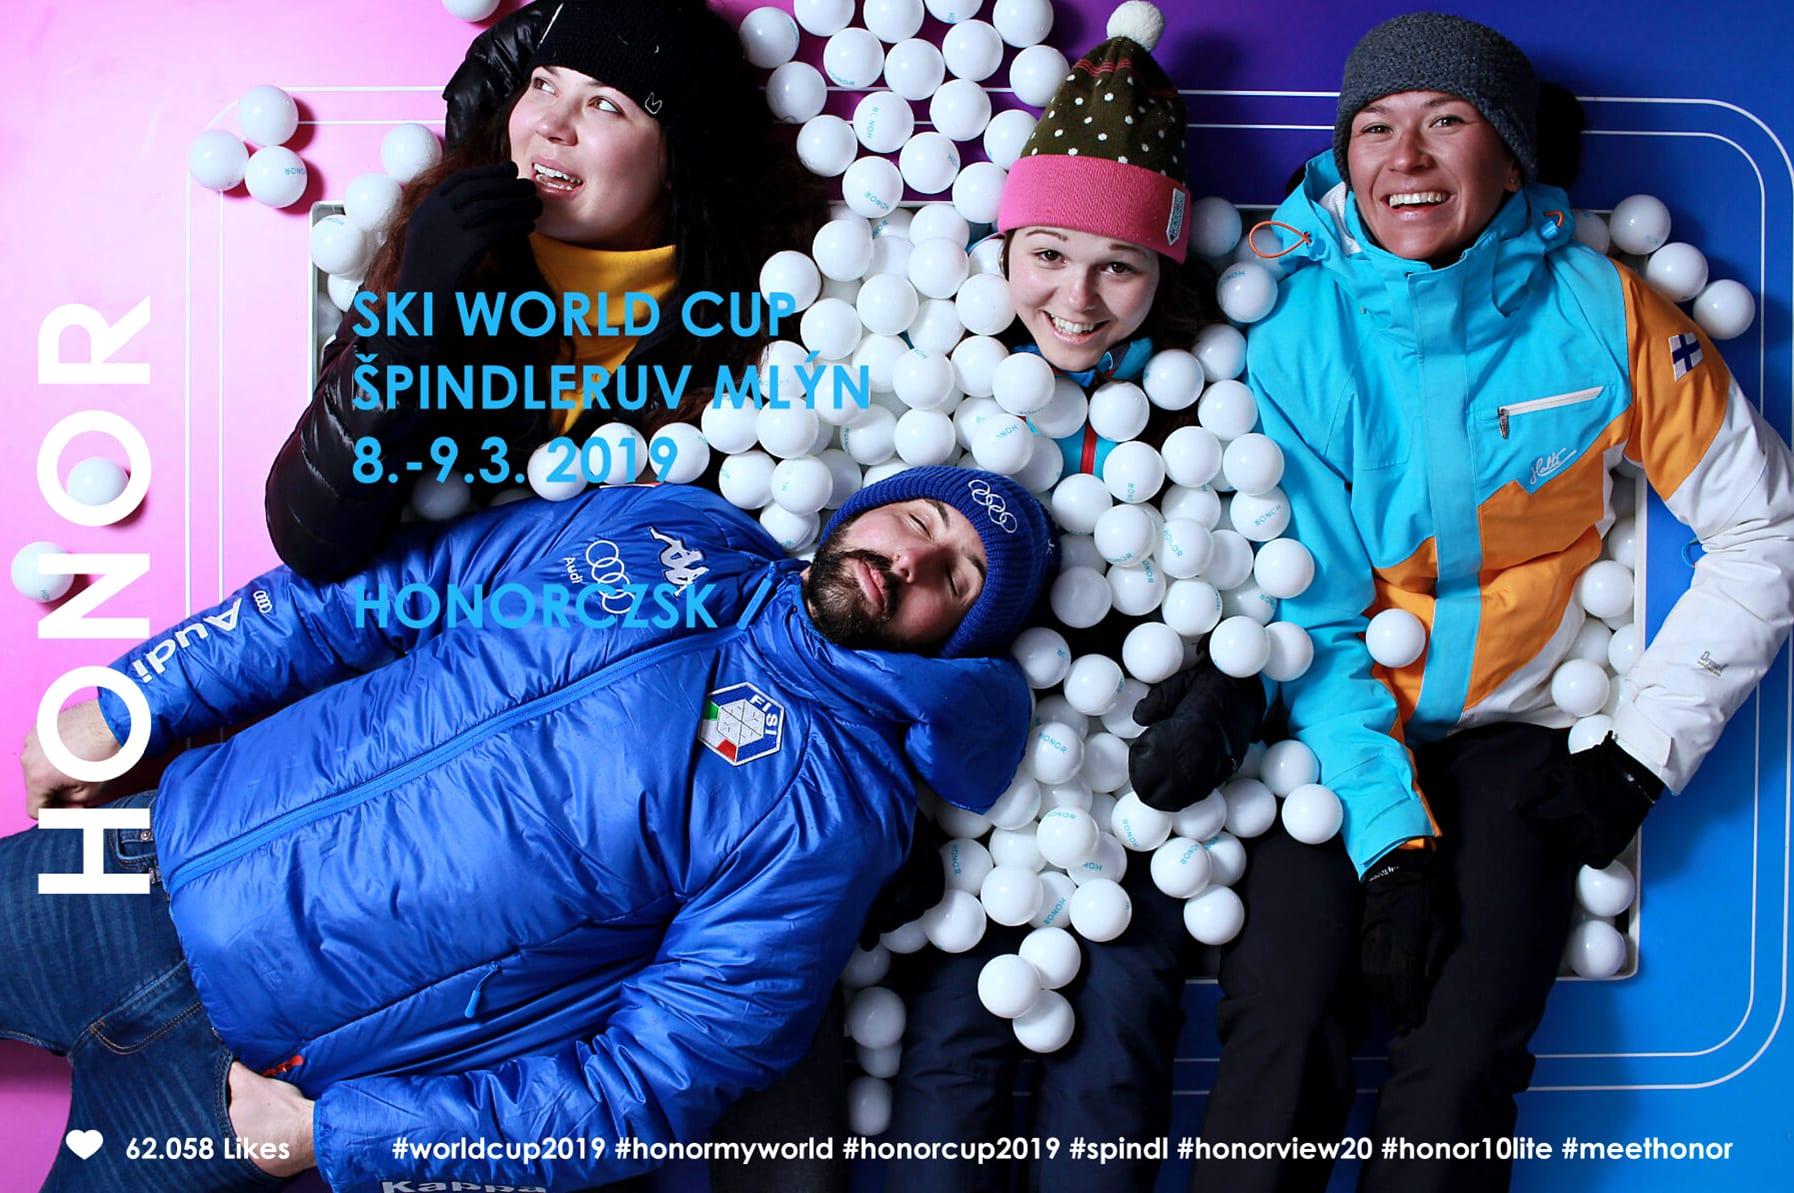 fotokoutek-hradec-kralove-promo-akce-honor-7-3-2019-588251